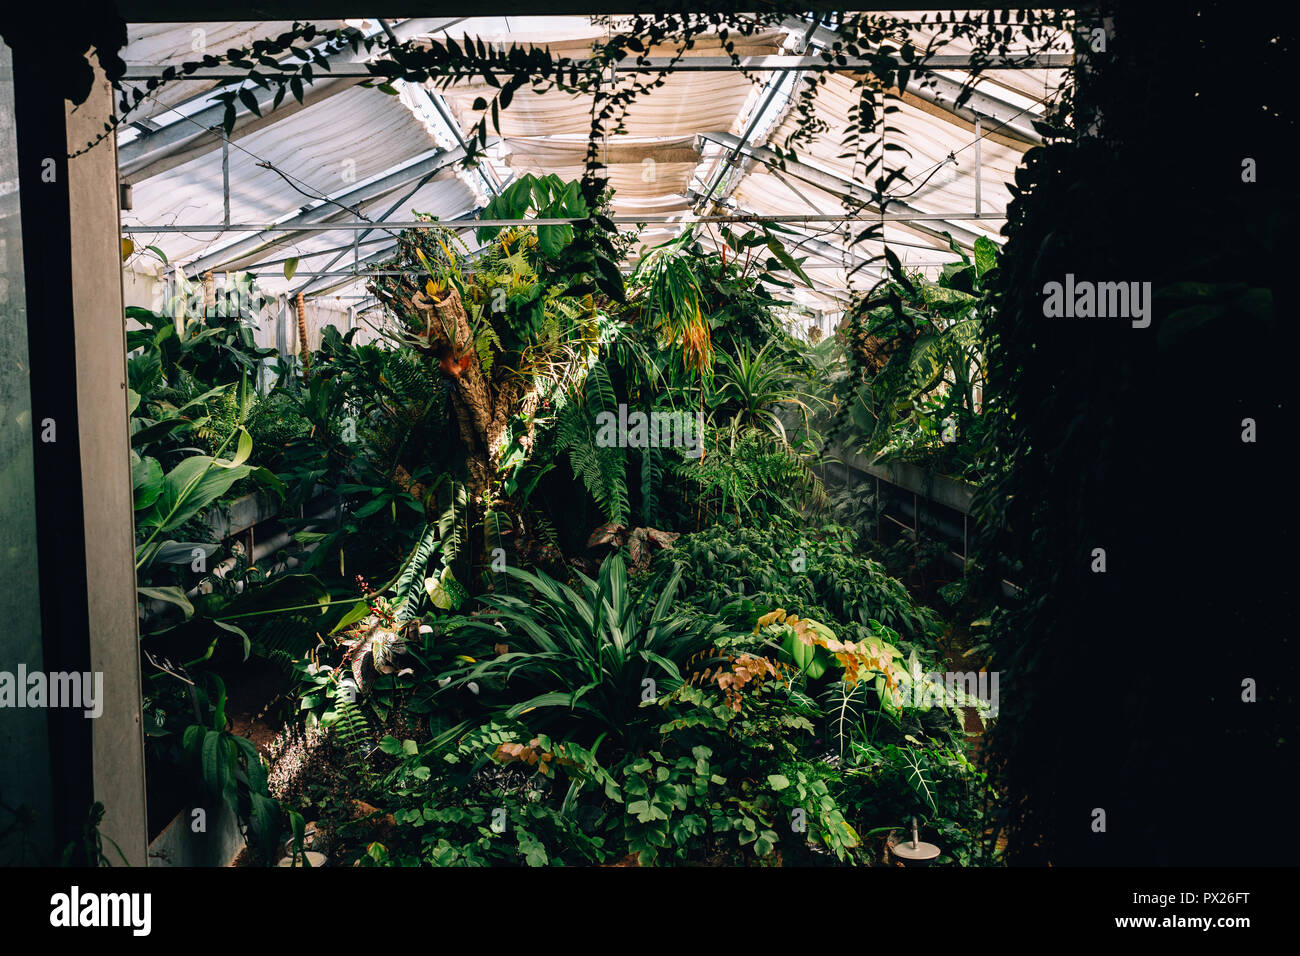 Botanical Garden, Lyon, France, 2018 - Stock Image